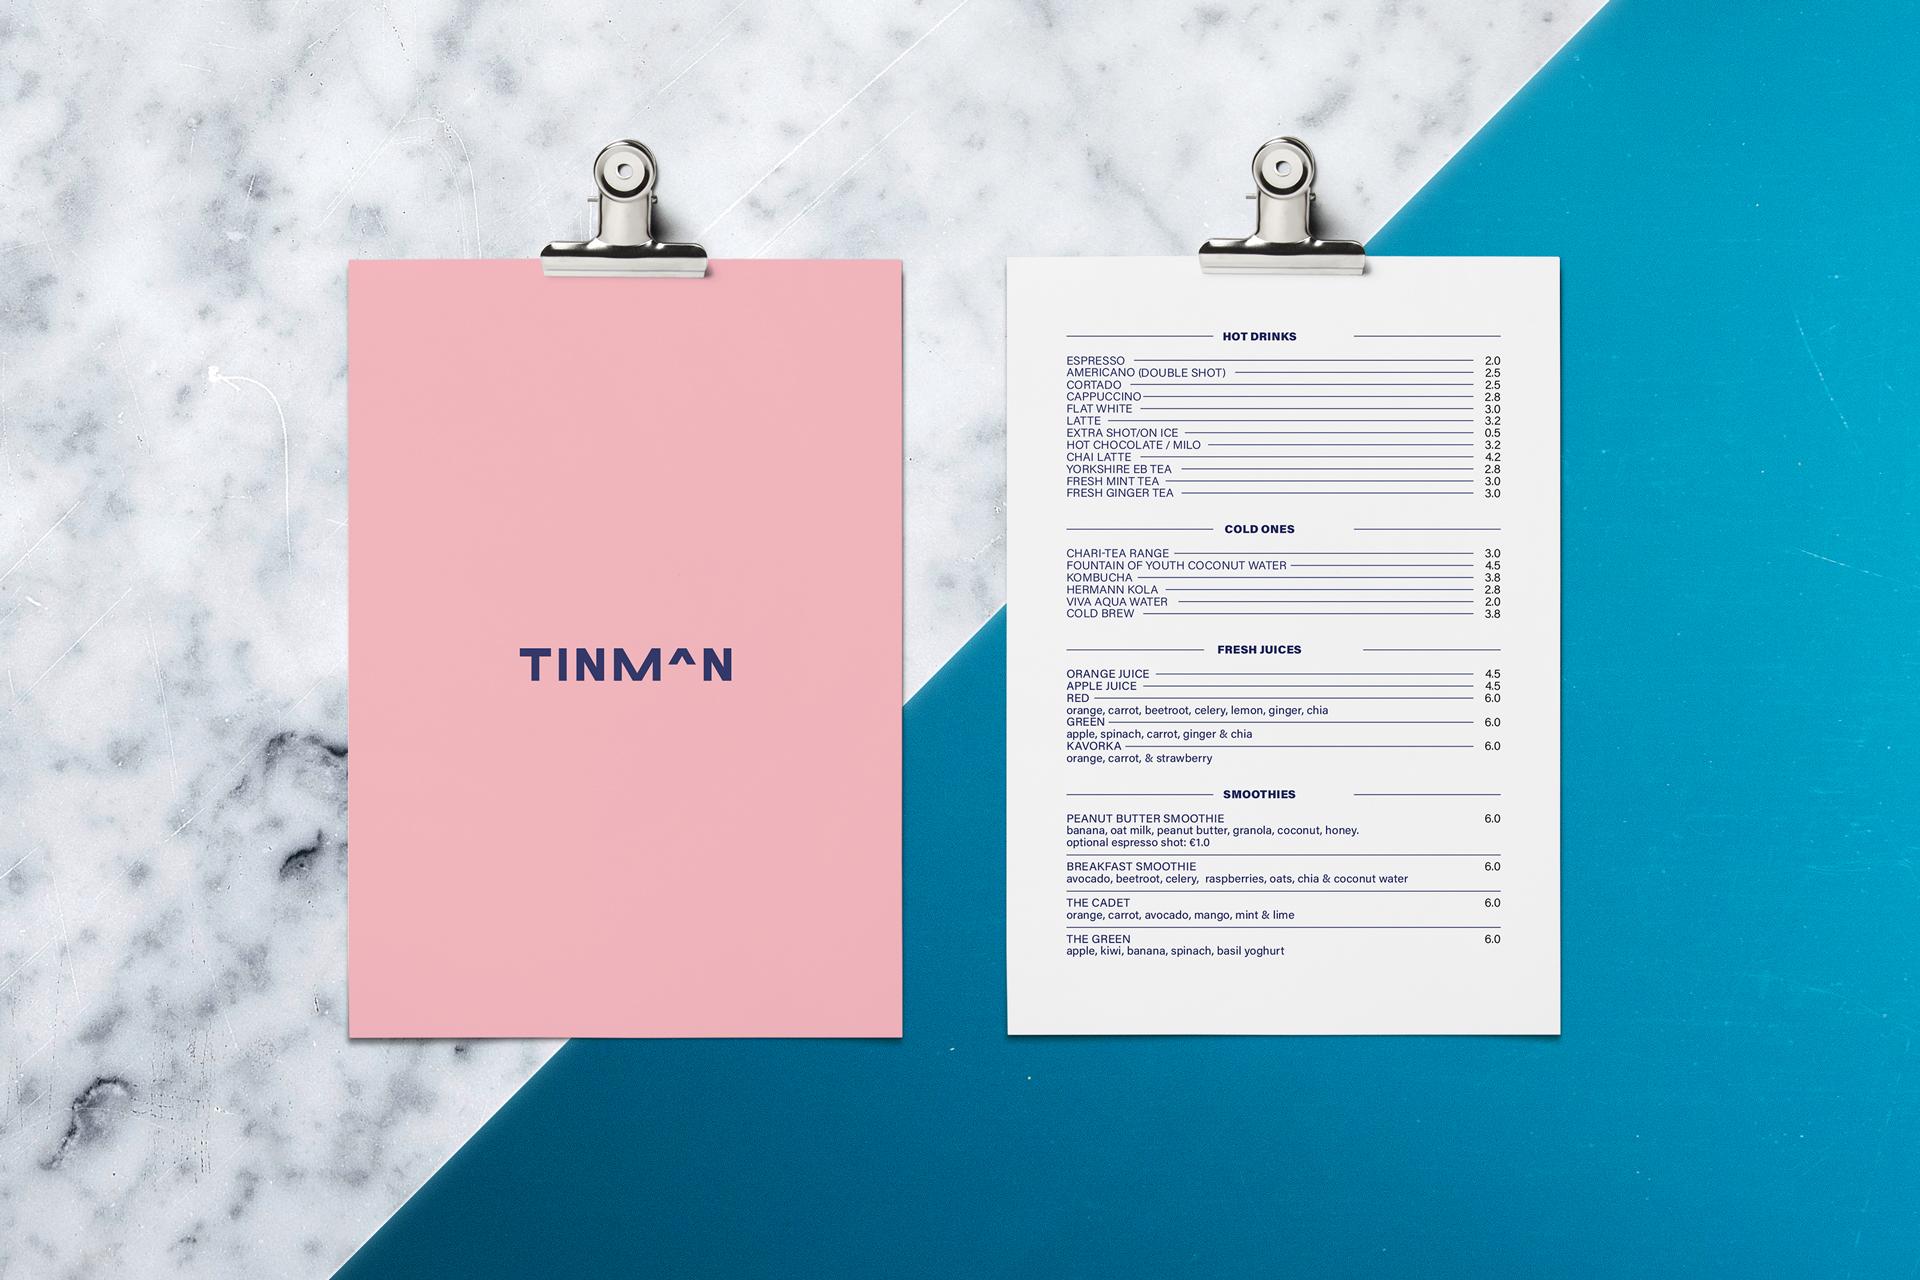 tinman-menu